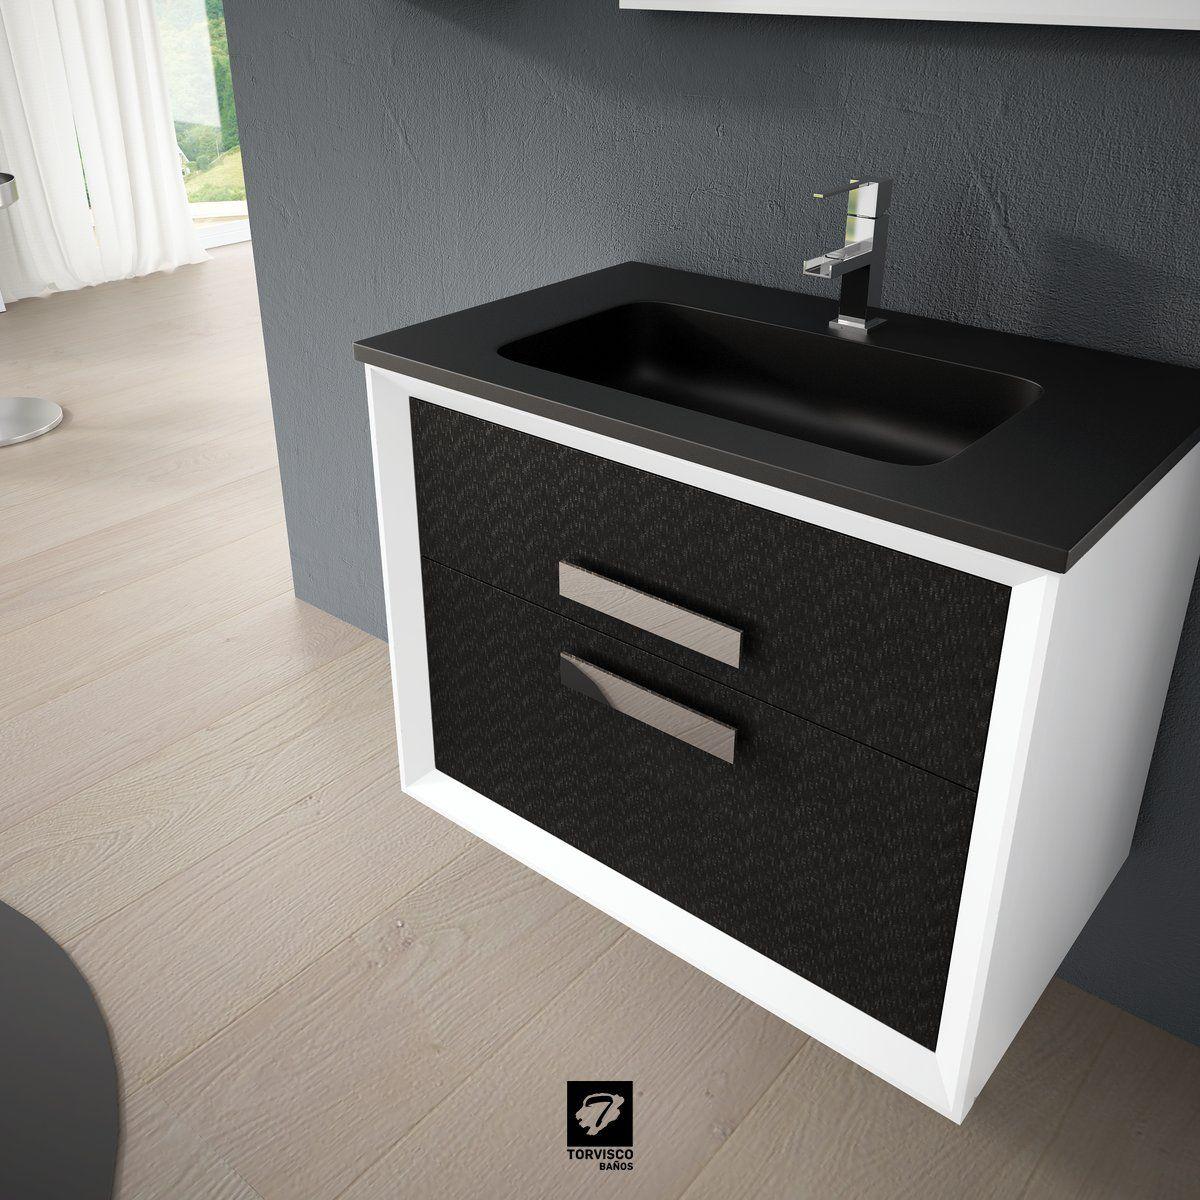 Detalle De La Encimera Dubai En Negro Metalizado Sobre El Mueble  # Mueble Loa Torvisco